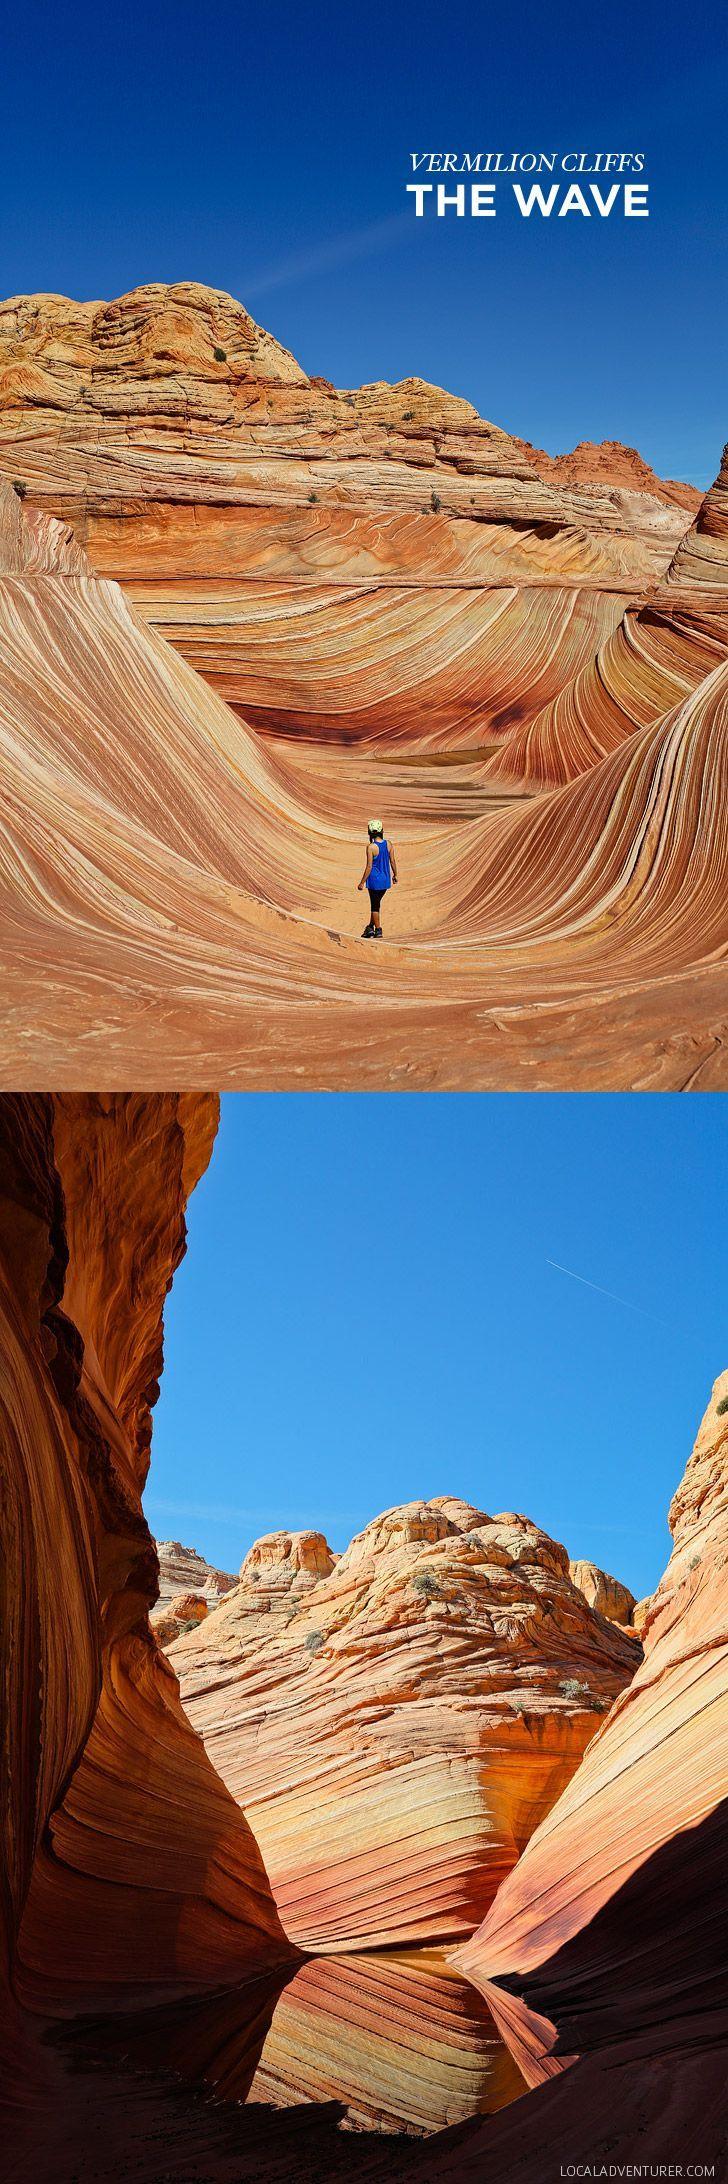 Hose canyon az